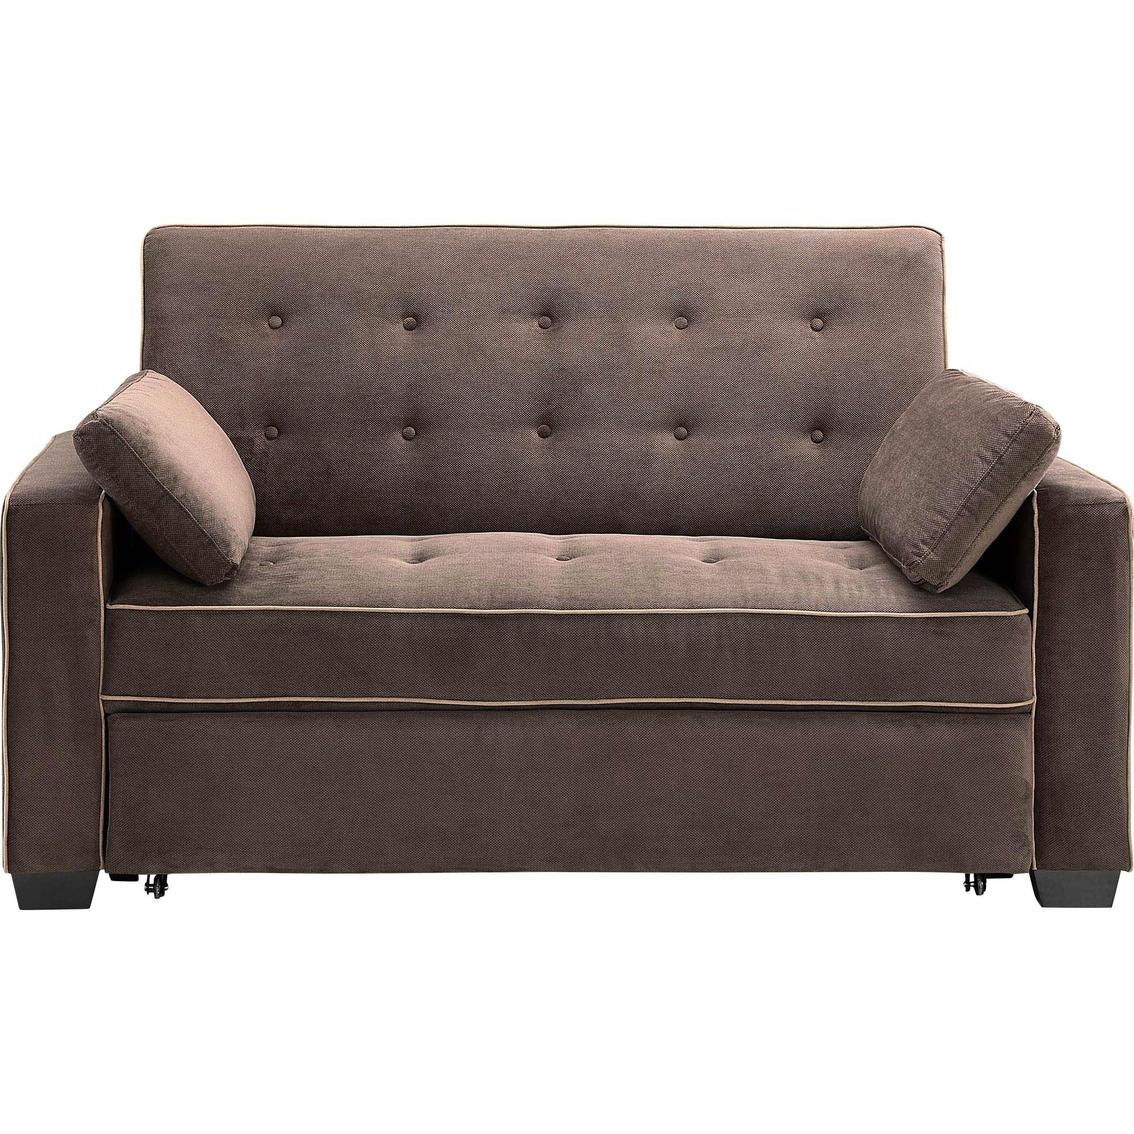 Serta Augustine Convertible Full size Sleeper Sofa   Sofas ...